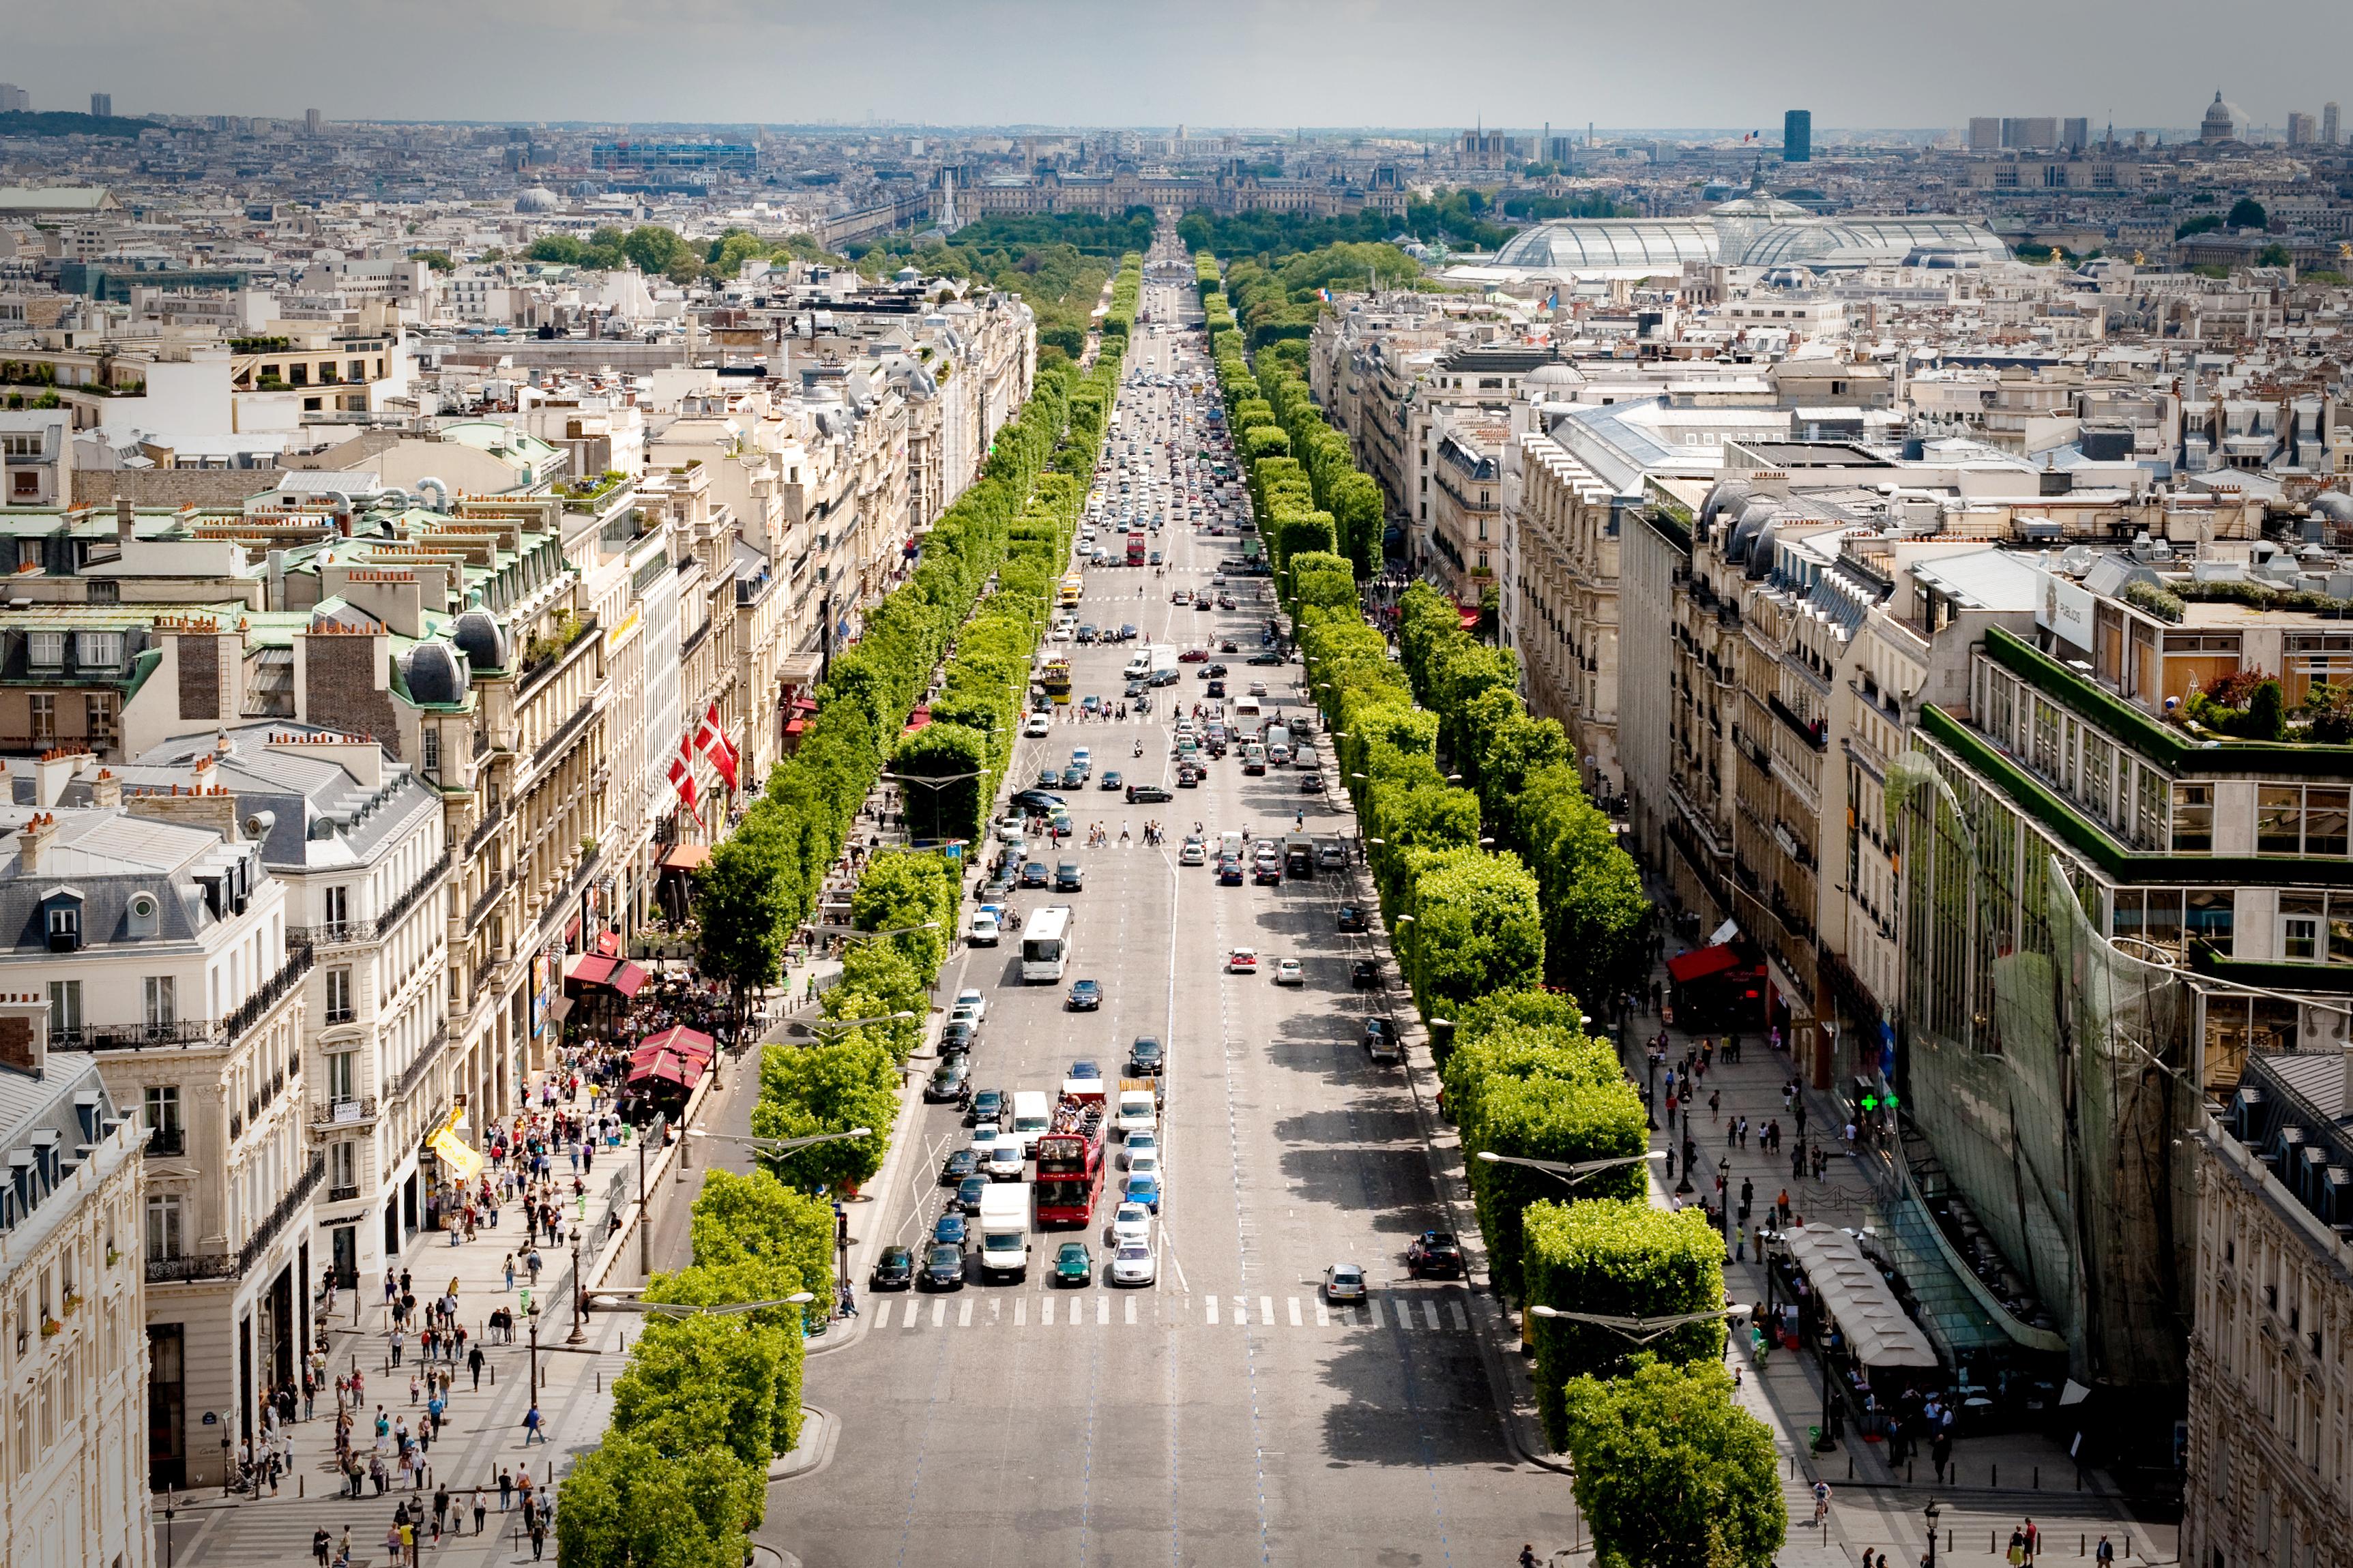 Avenue des Champs-Elysees July 24, 2009 N1.jpg